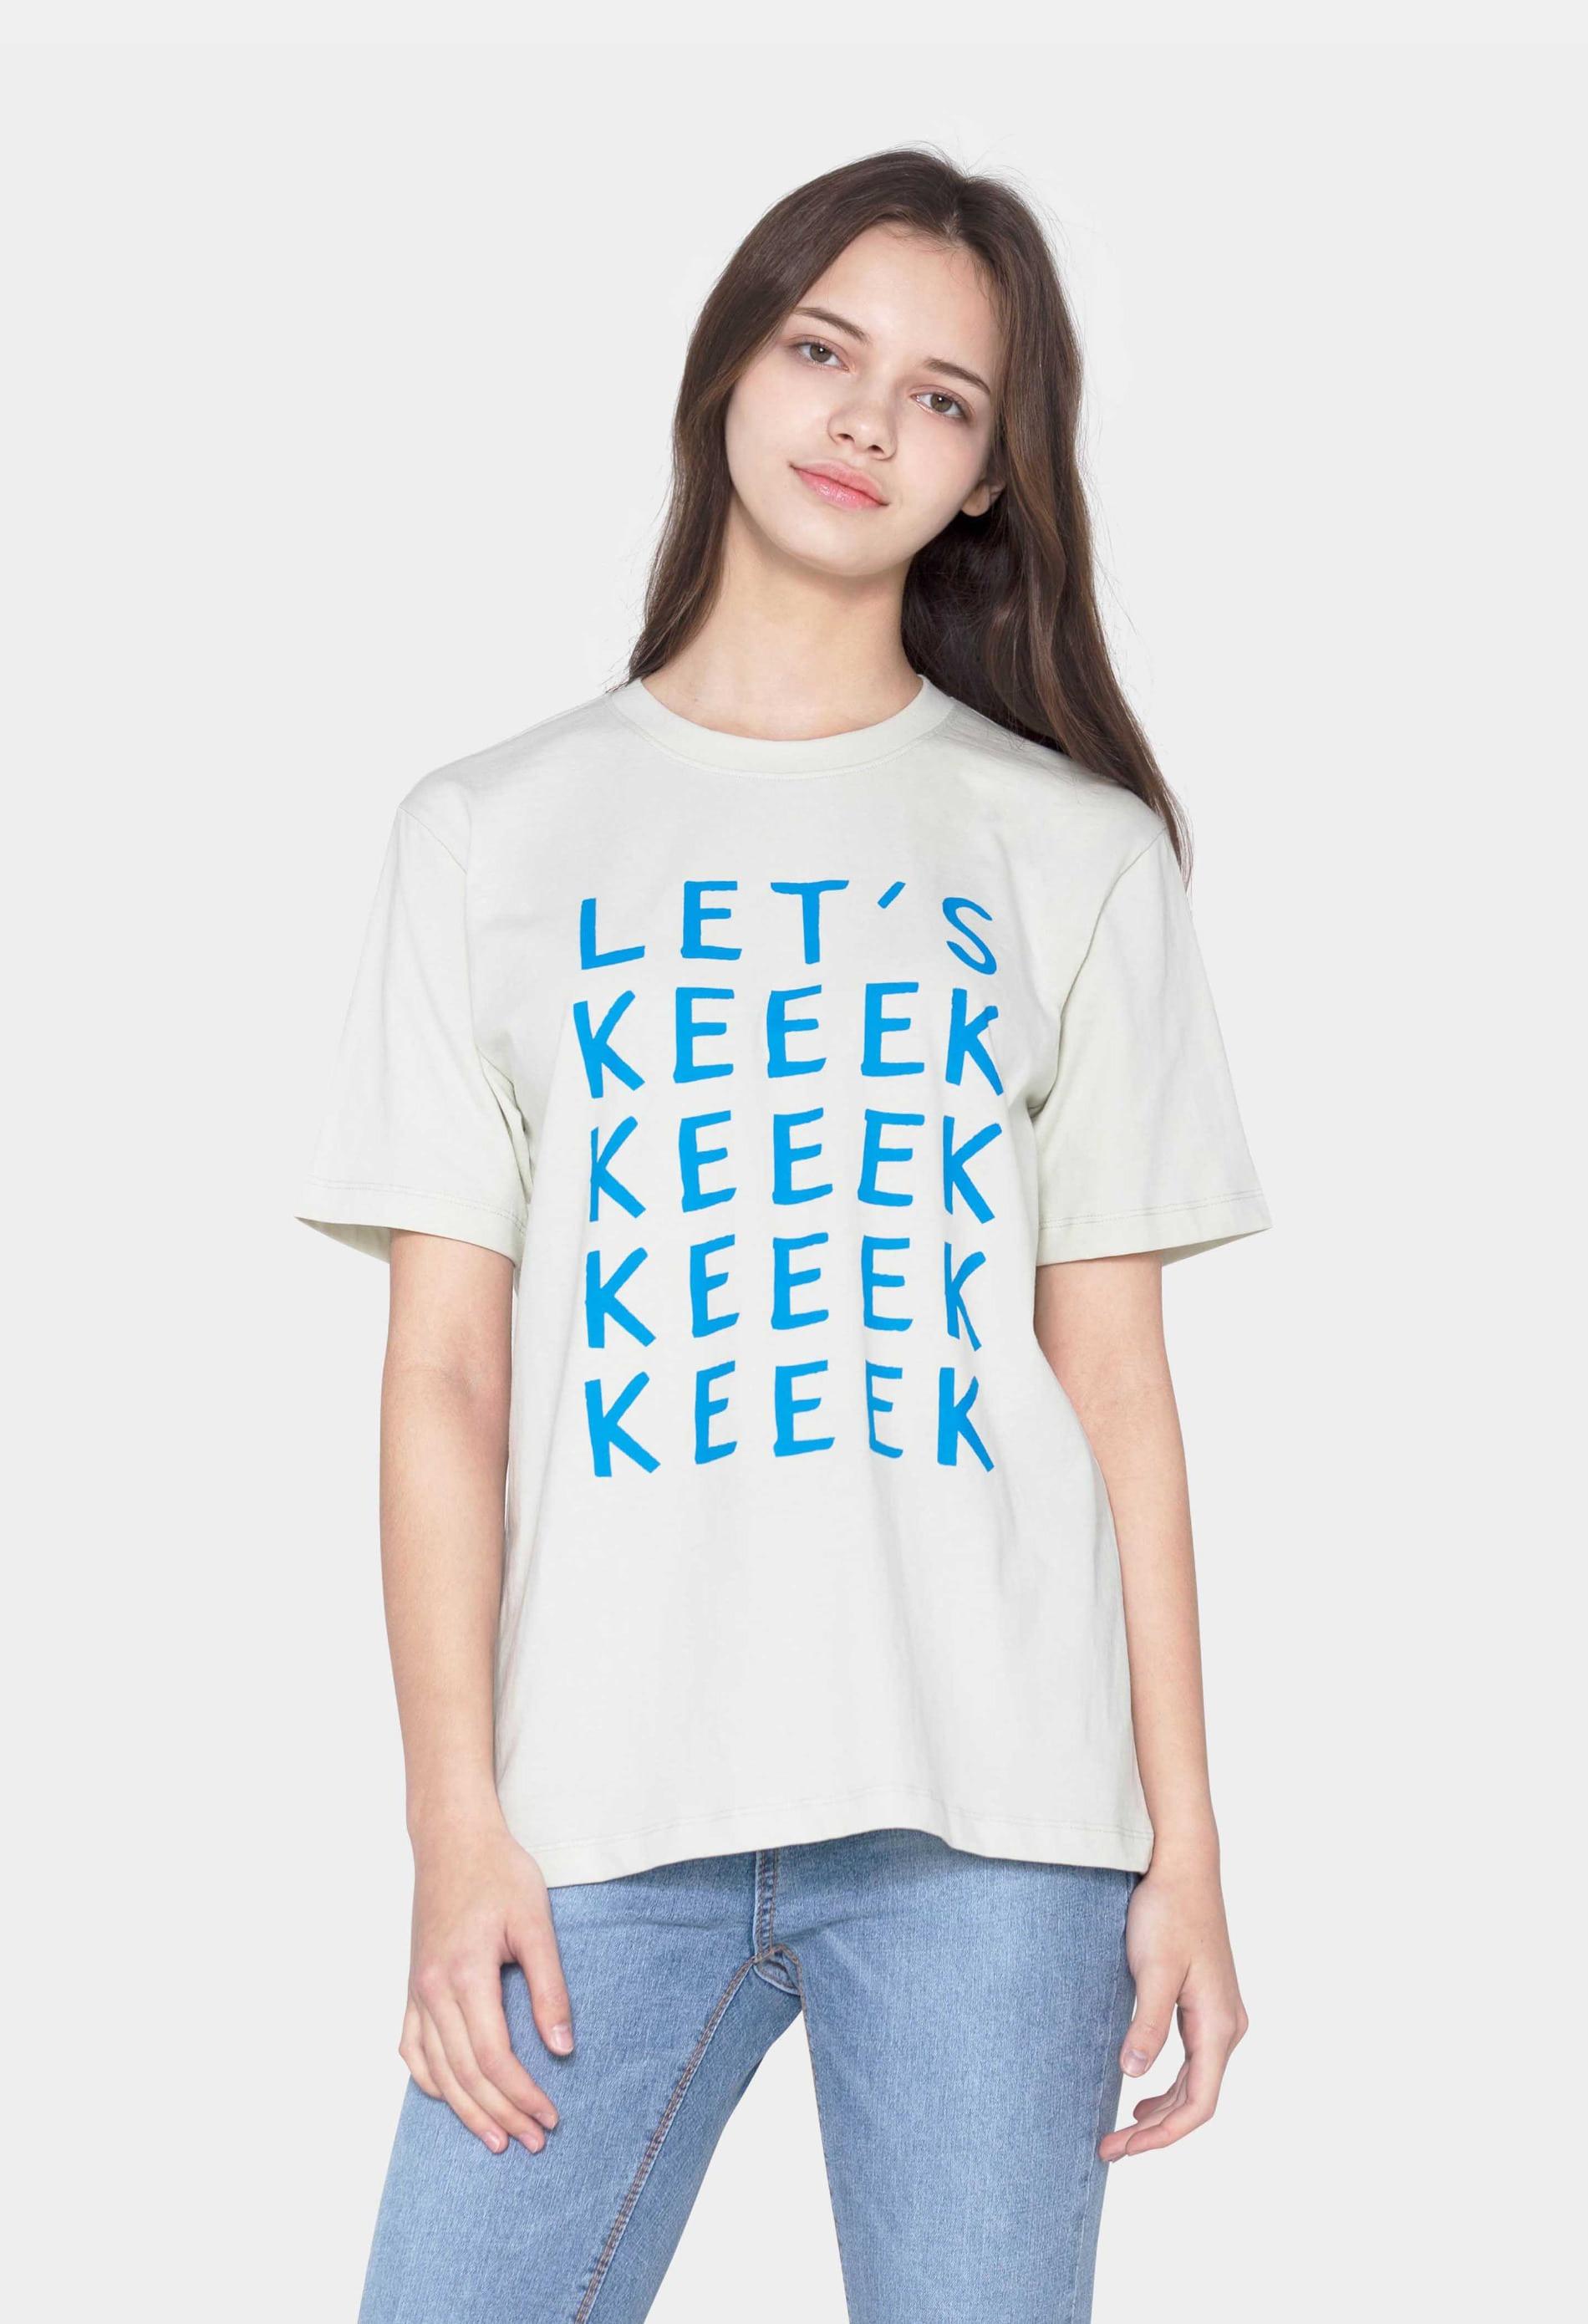 keek [Unisex] KEEEK T-shirts - Antique Ivory 스트릿패션 유니섹스브랜드 커플시밀러룩 남자쇼핑몰 여성의류쇼핑몰 후드티 힙색